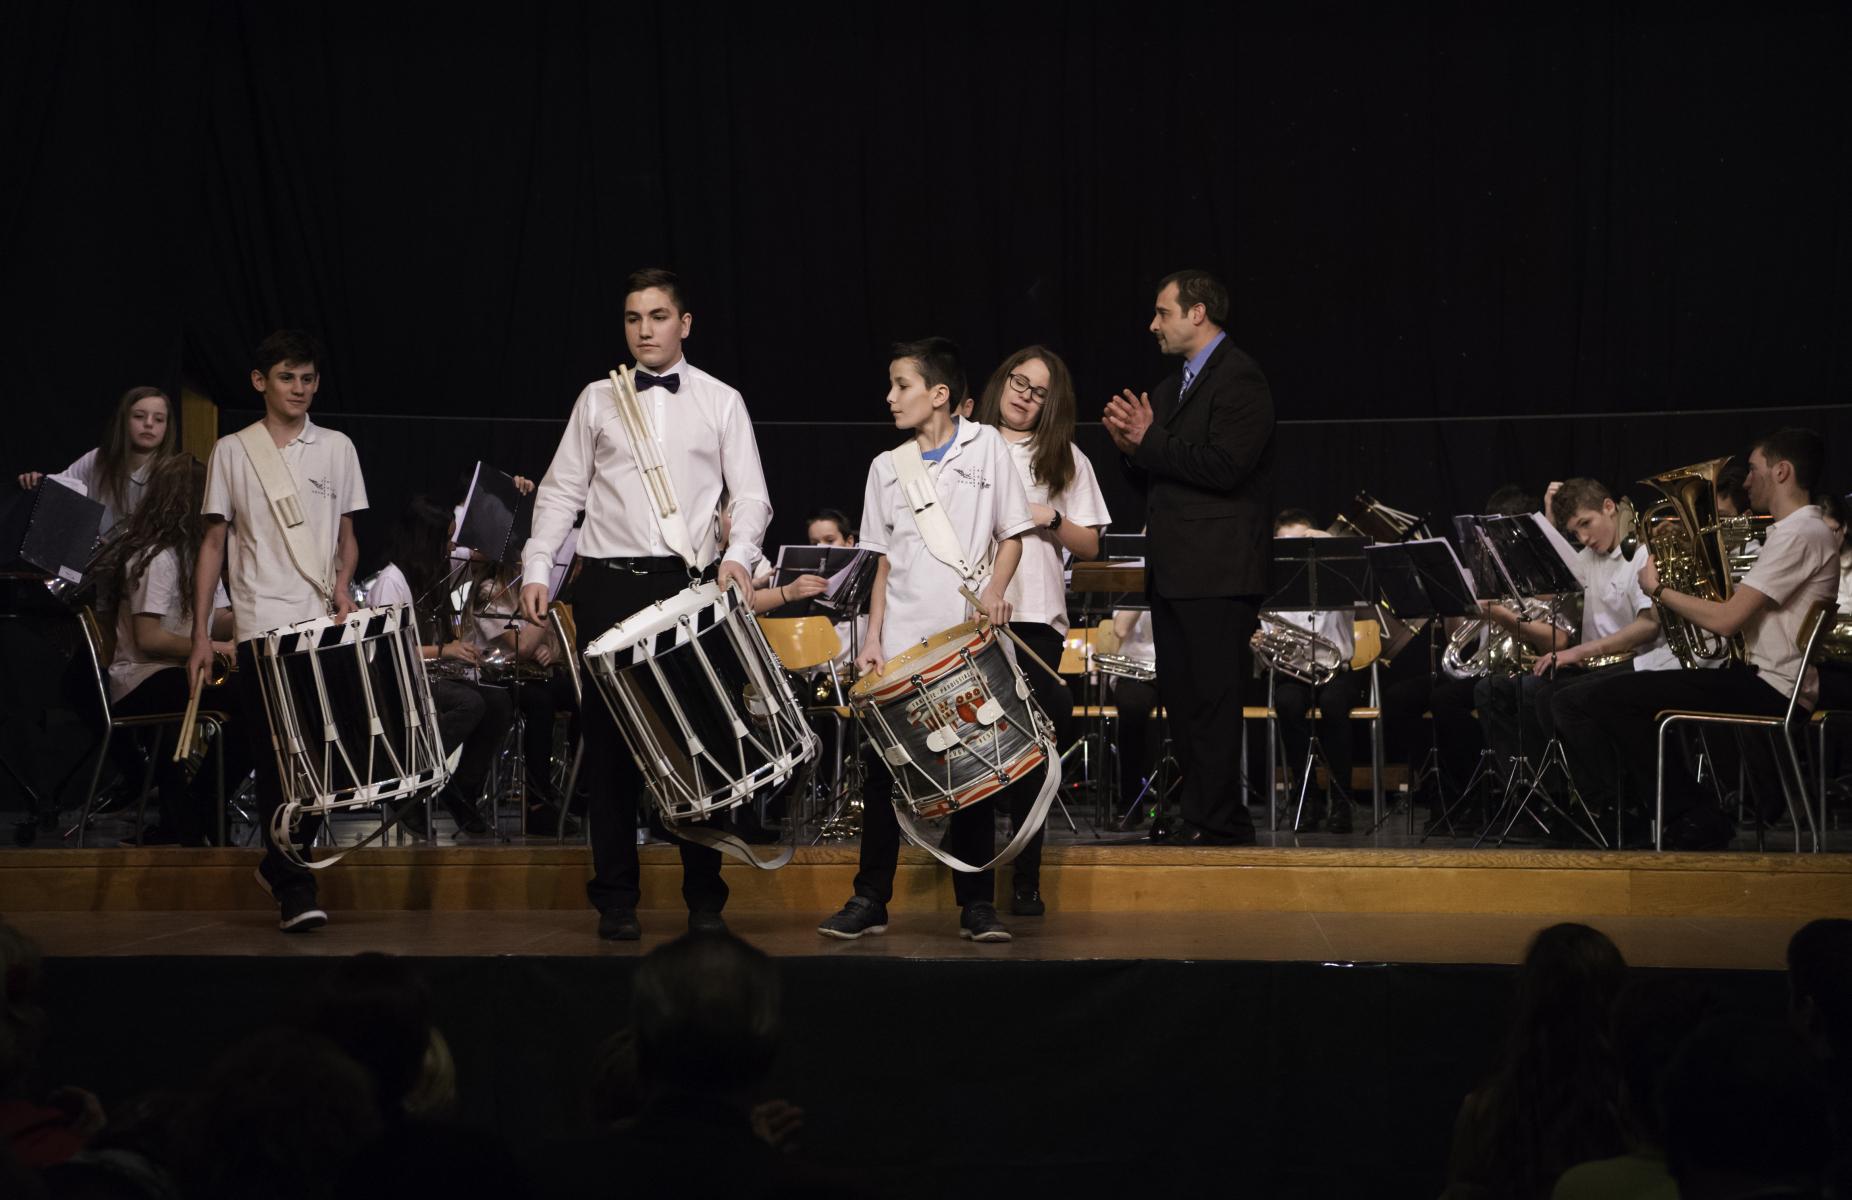 170211_concert_annuel17-019